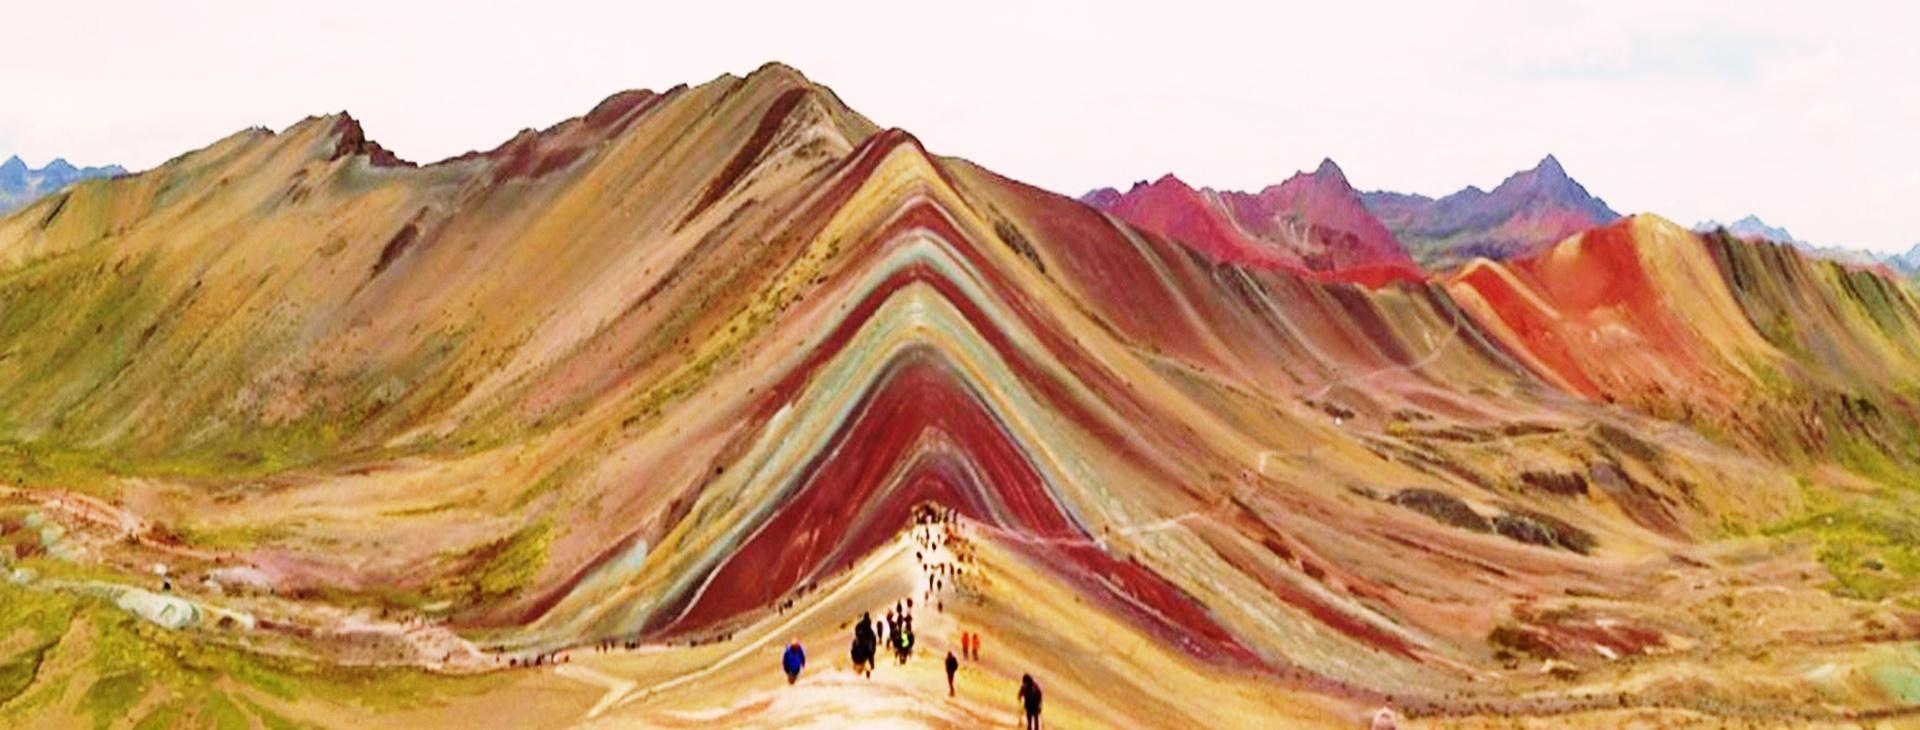 Montaña de 7 colores Ausangate 1 dia - TOURS PERU MACHU PICCHU